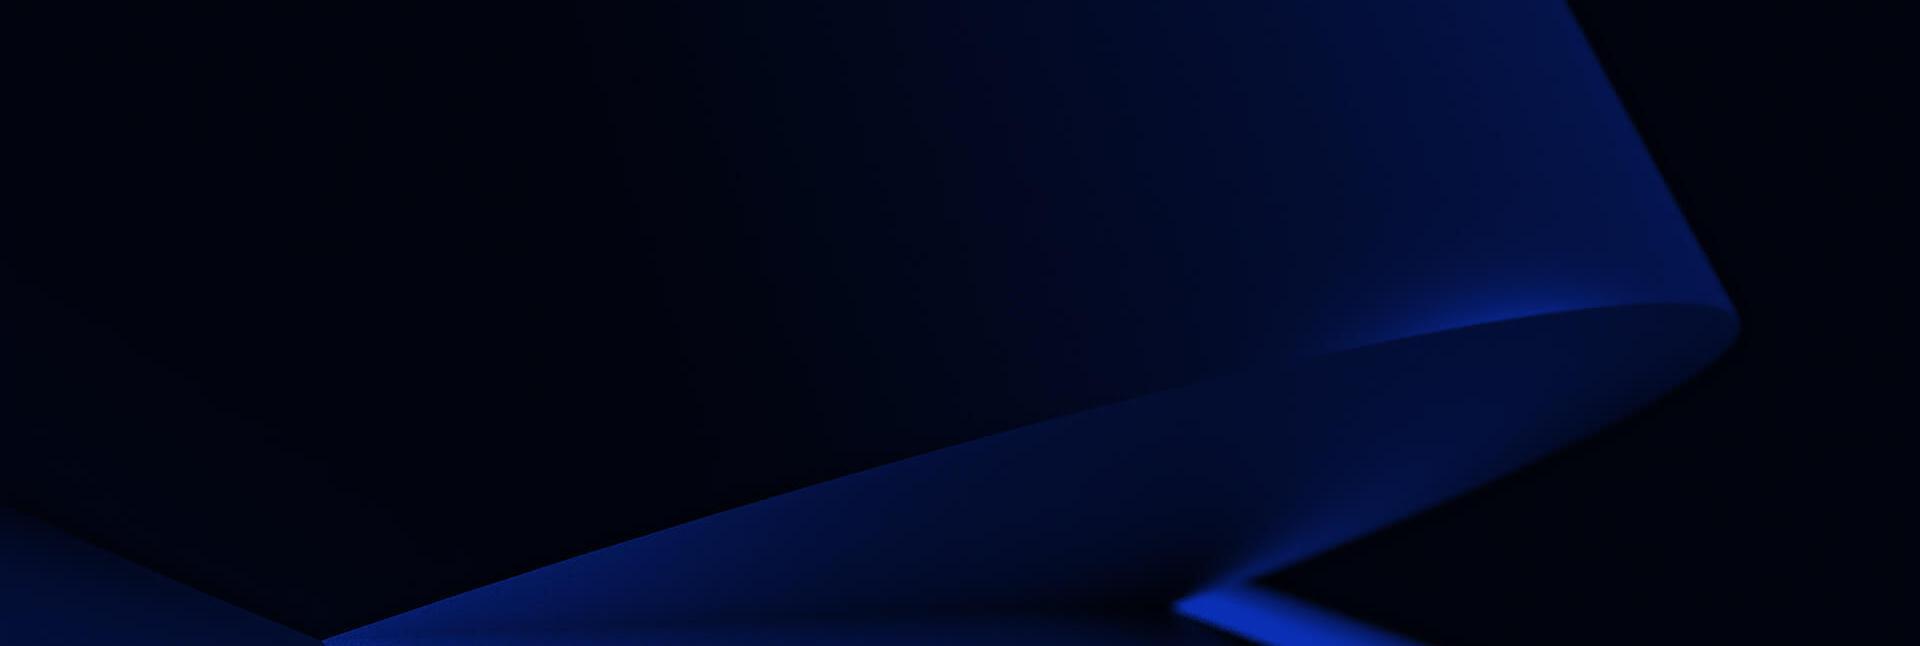 rra-background-blue-9-2021.jpg